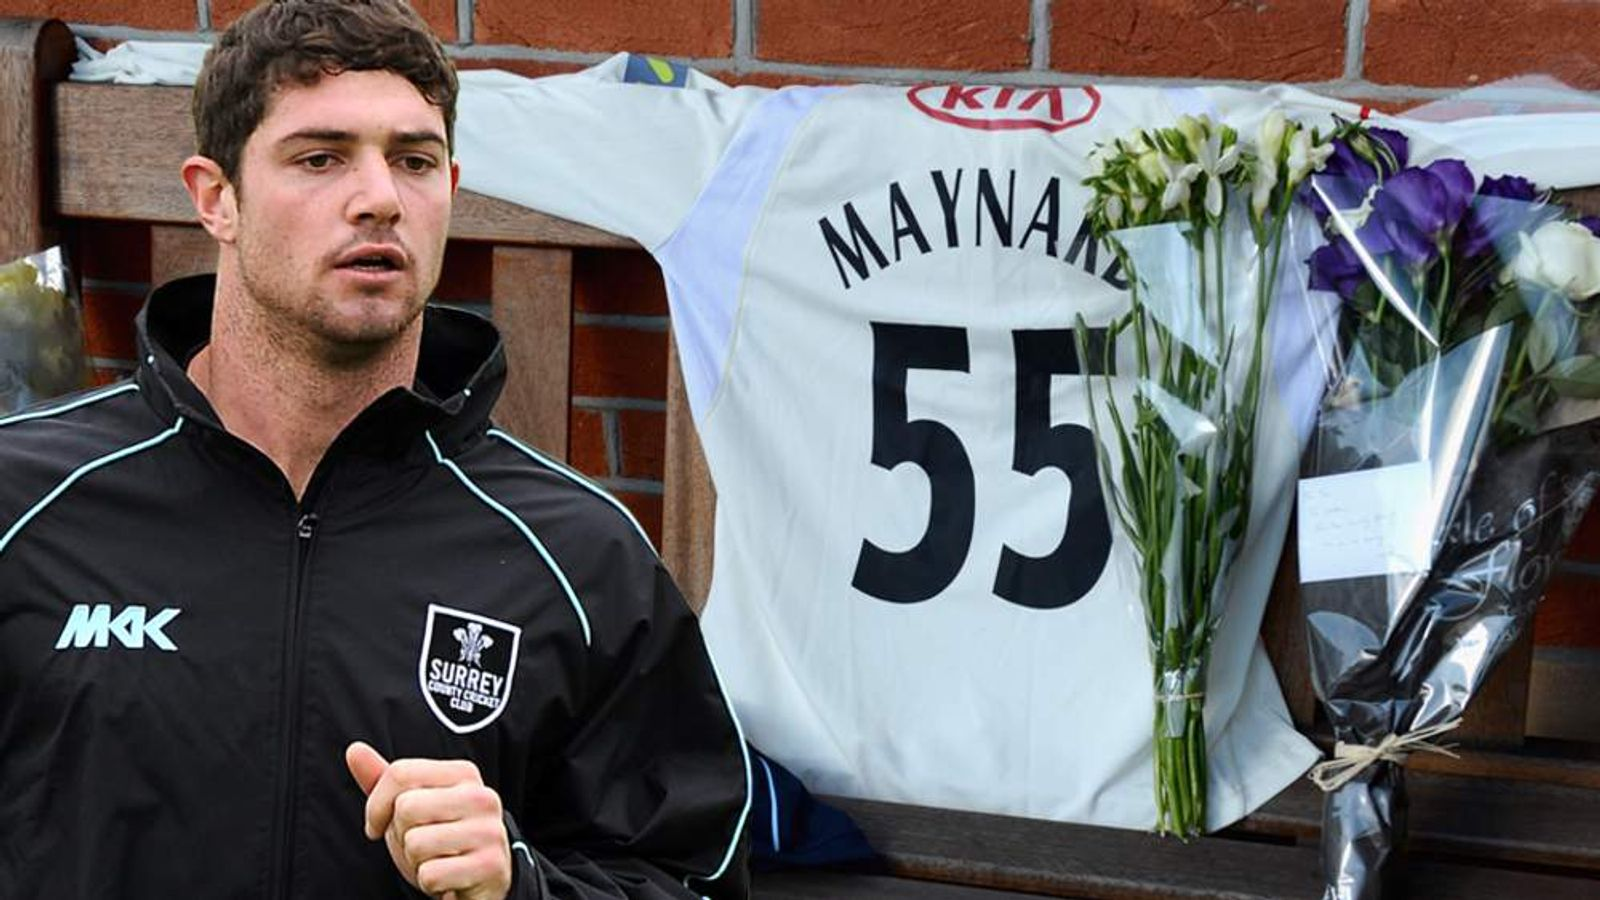 Floral tributes to Surrey cricketer Tom Maynard